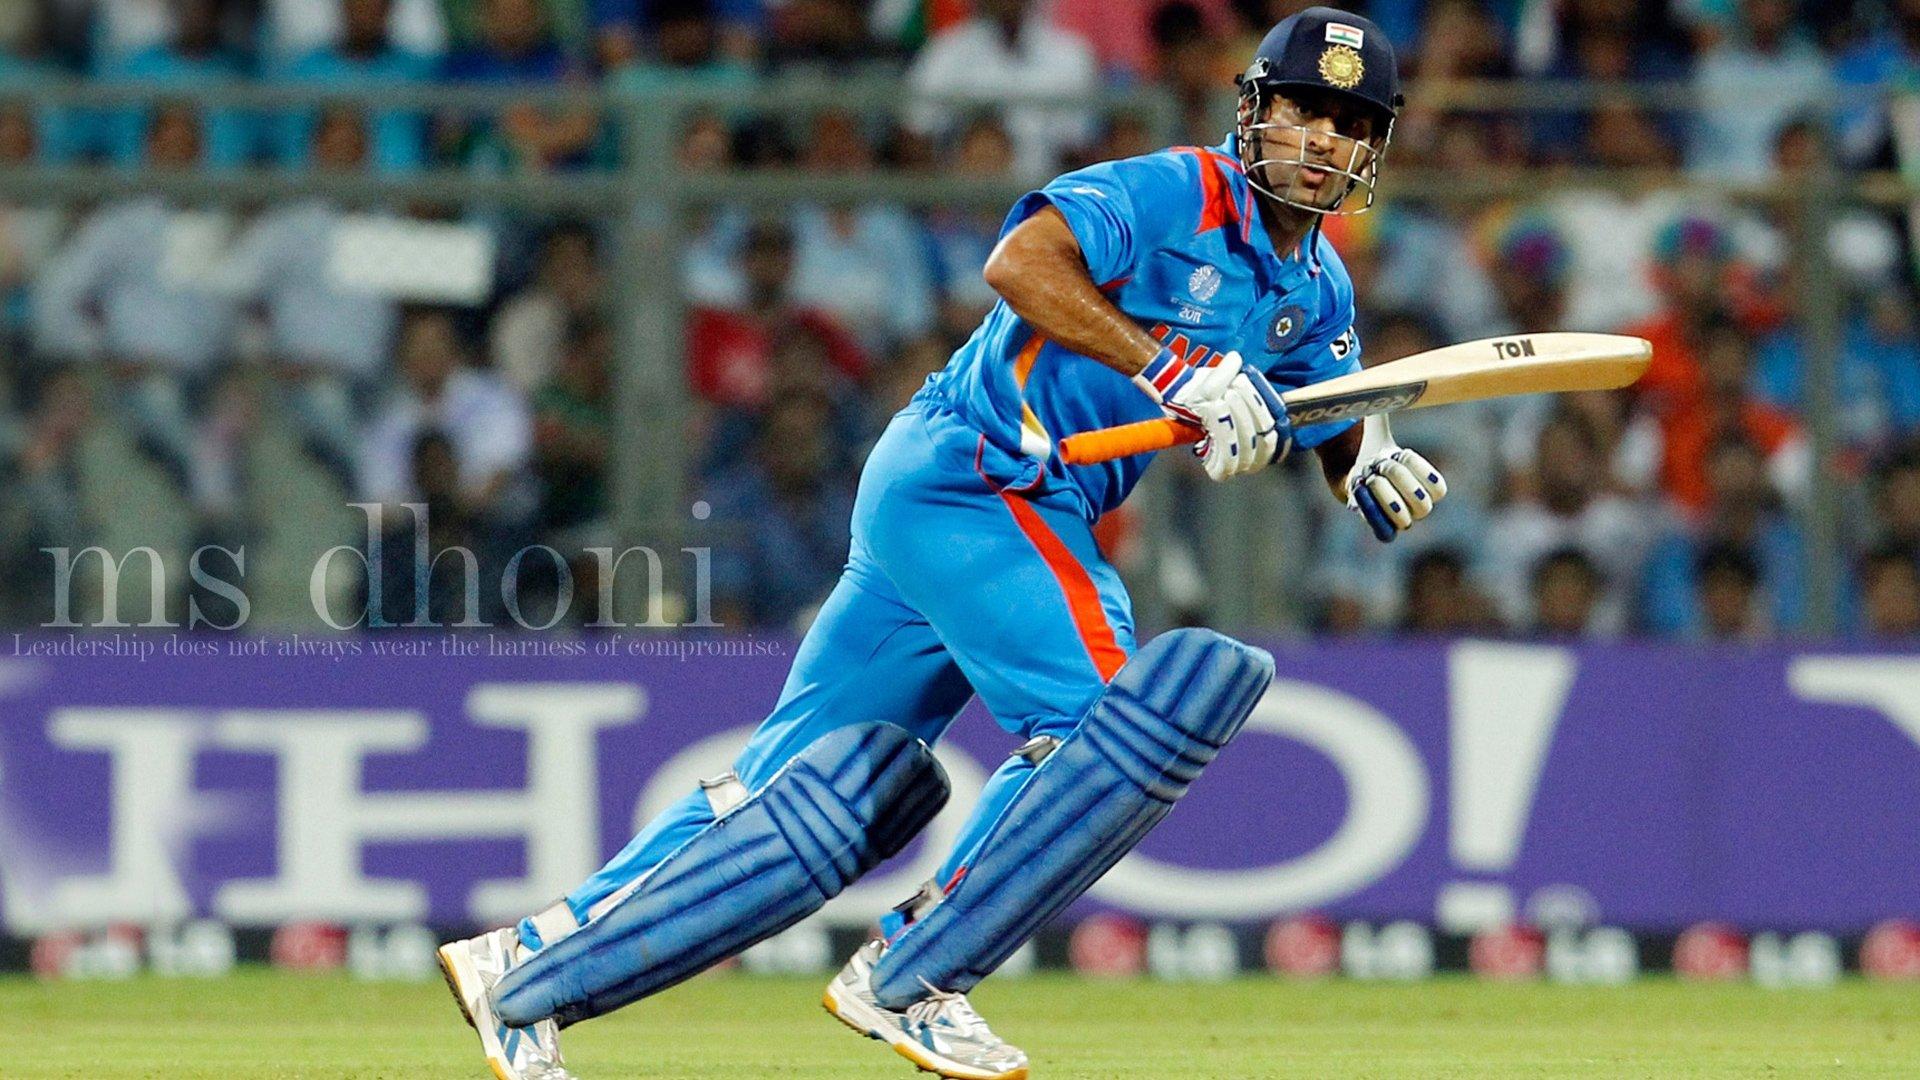 Batsman And Wicket Keeper Hd Wallpaper Background Image